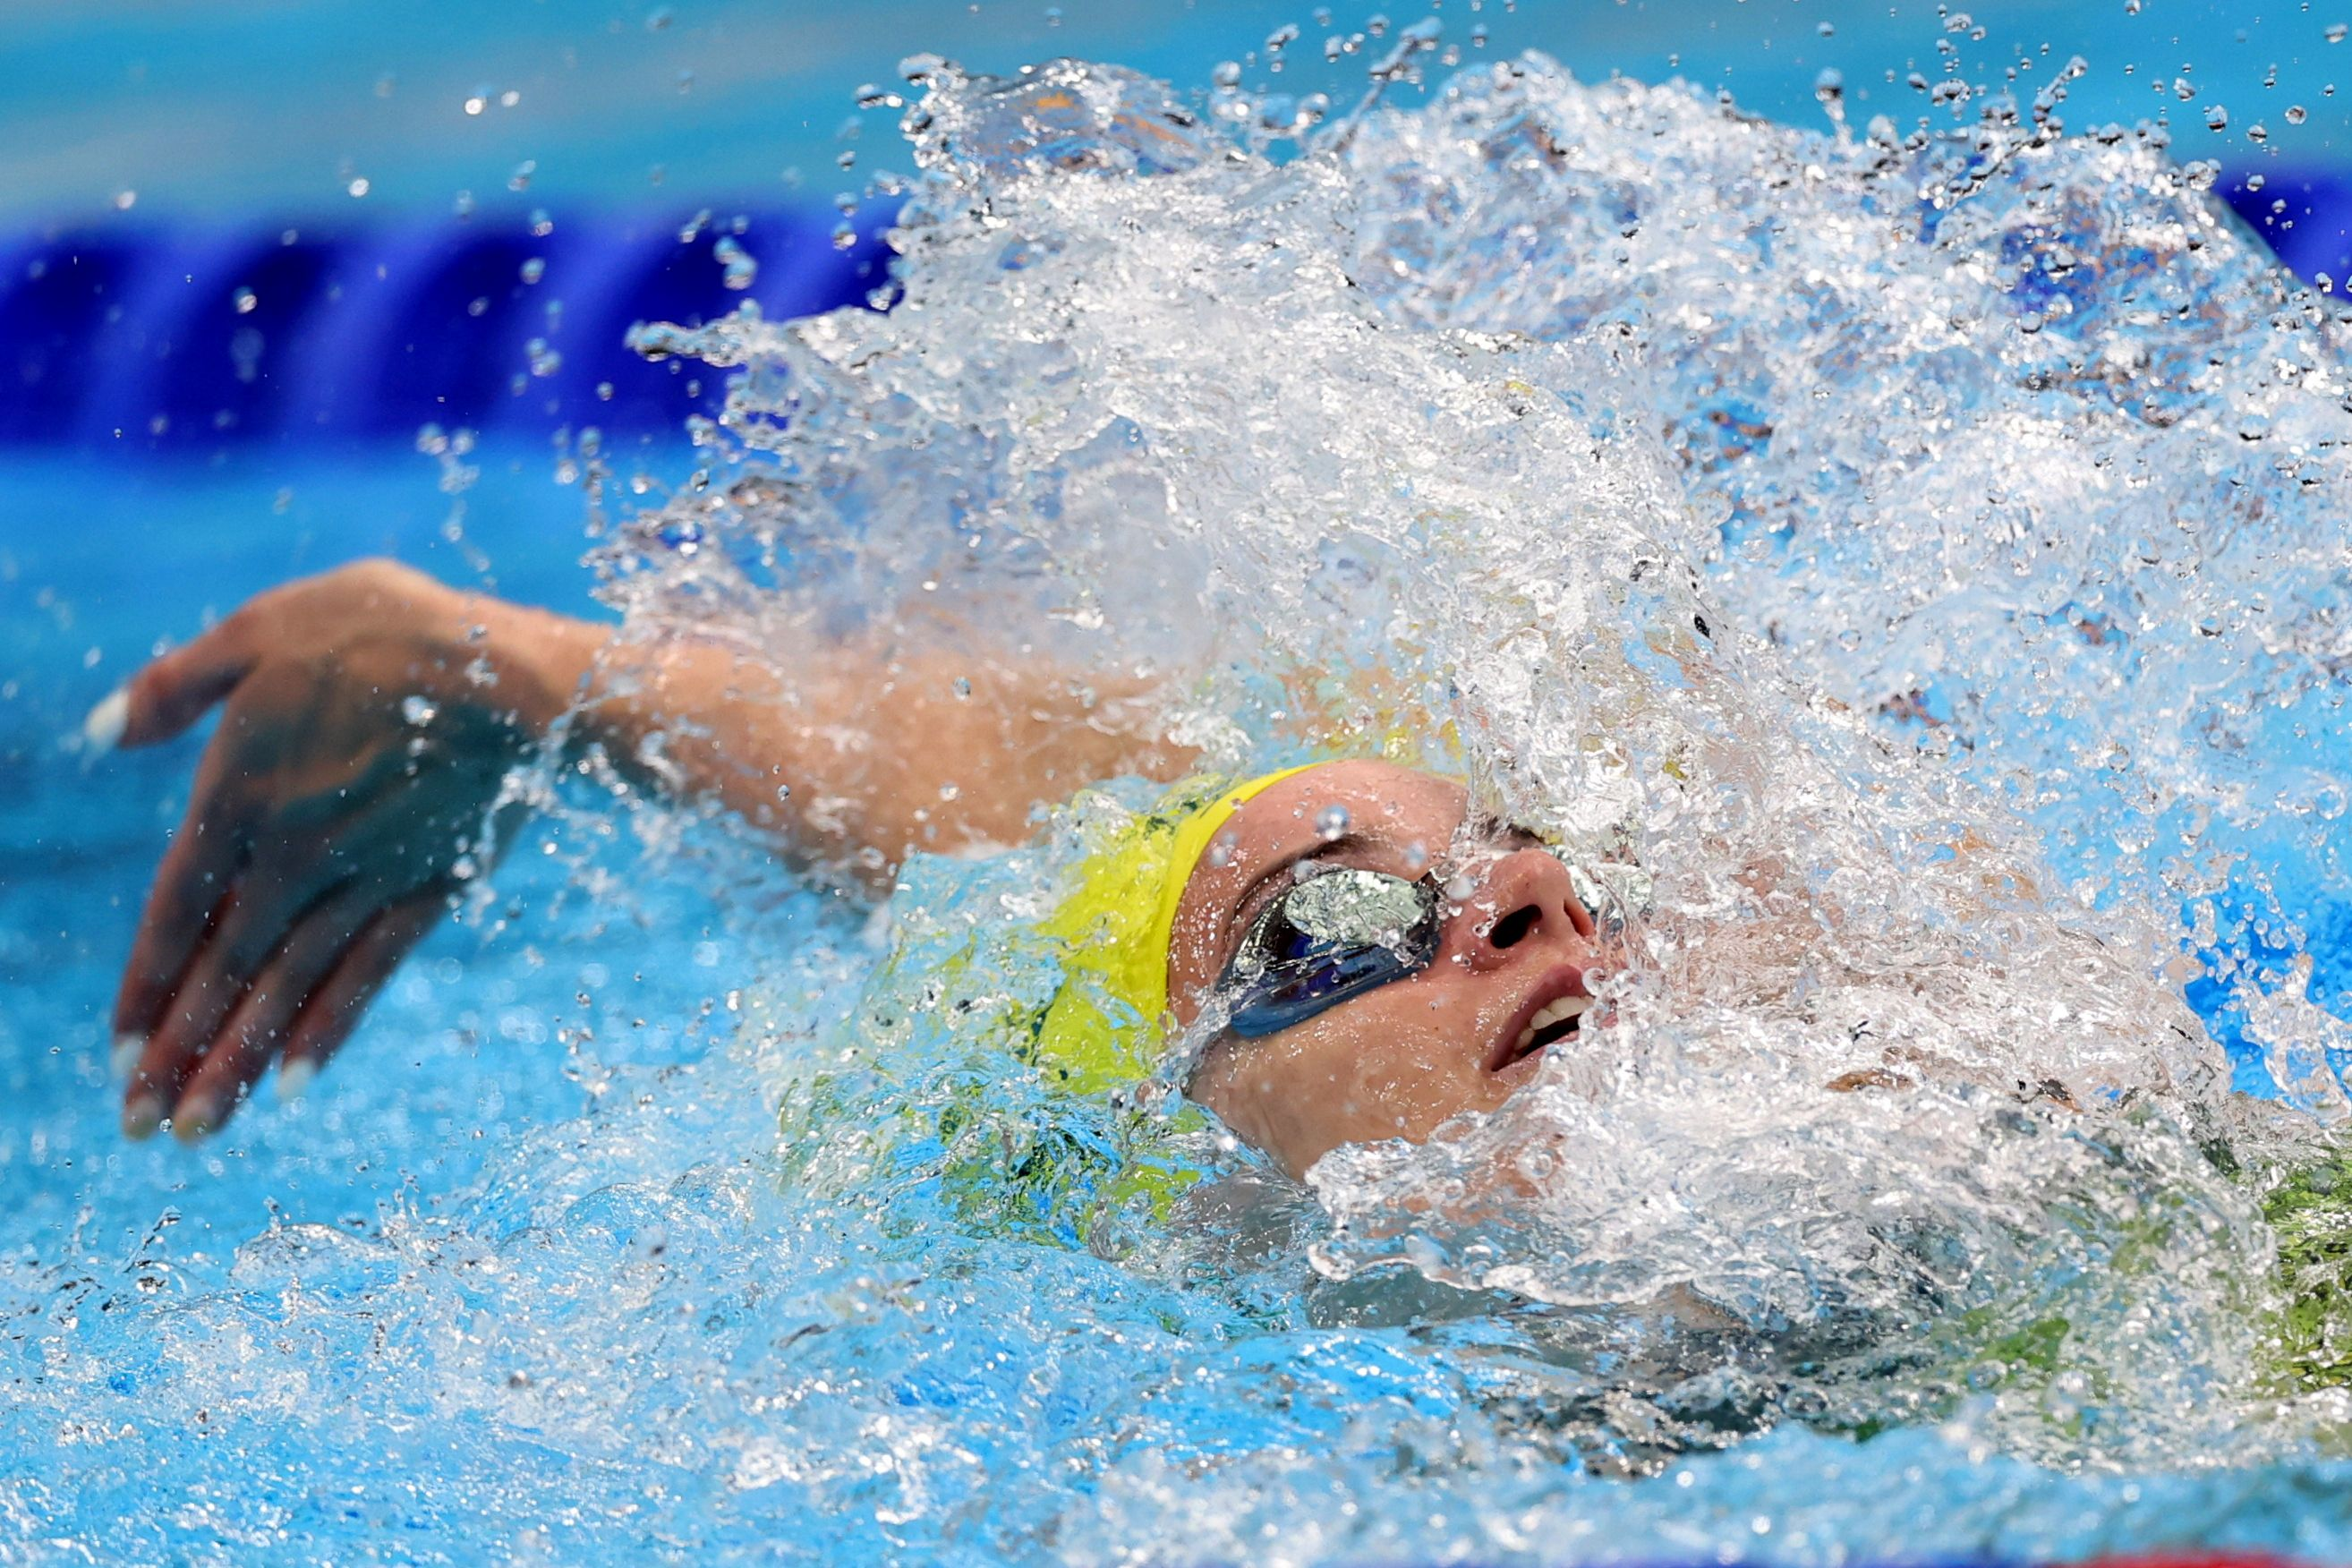 Tokyo 2020 Olympics - Swimming - Women's 200m Backstroke - Final - Tokyo Aquatics Centre - Tokyo, Japan - July 31, 2021. Kaylee McKeown of Australia in action. REUTERS/Carl Recine